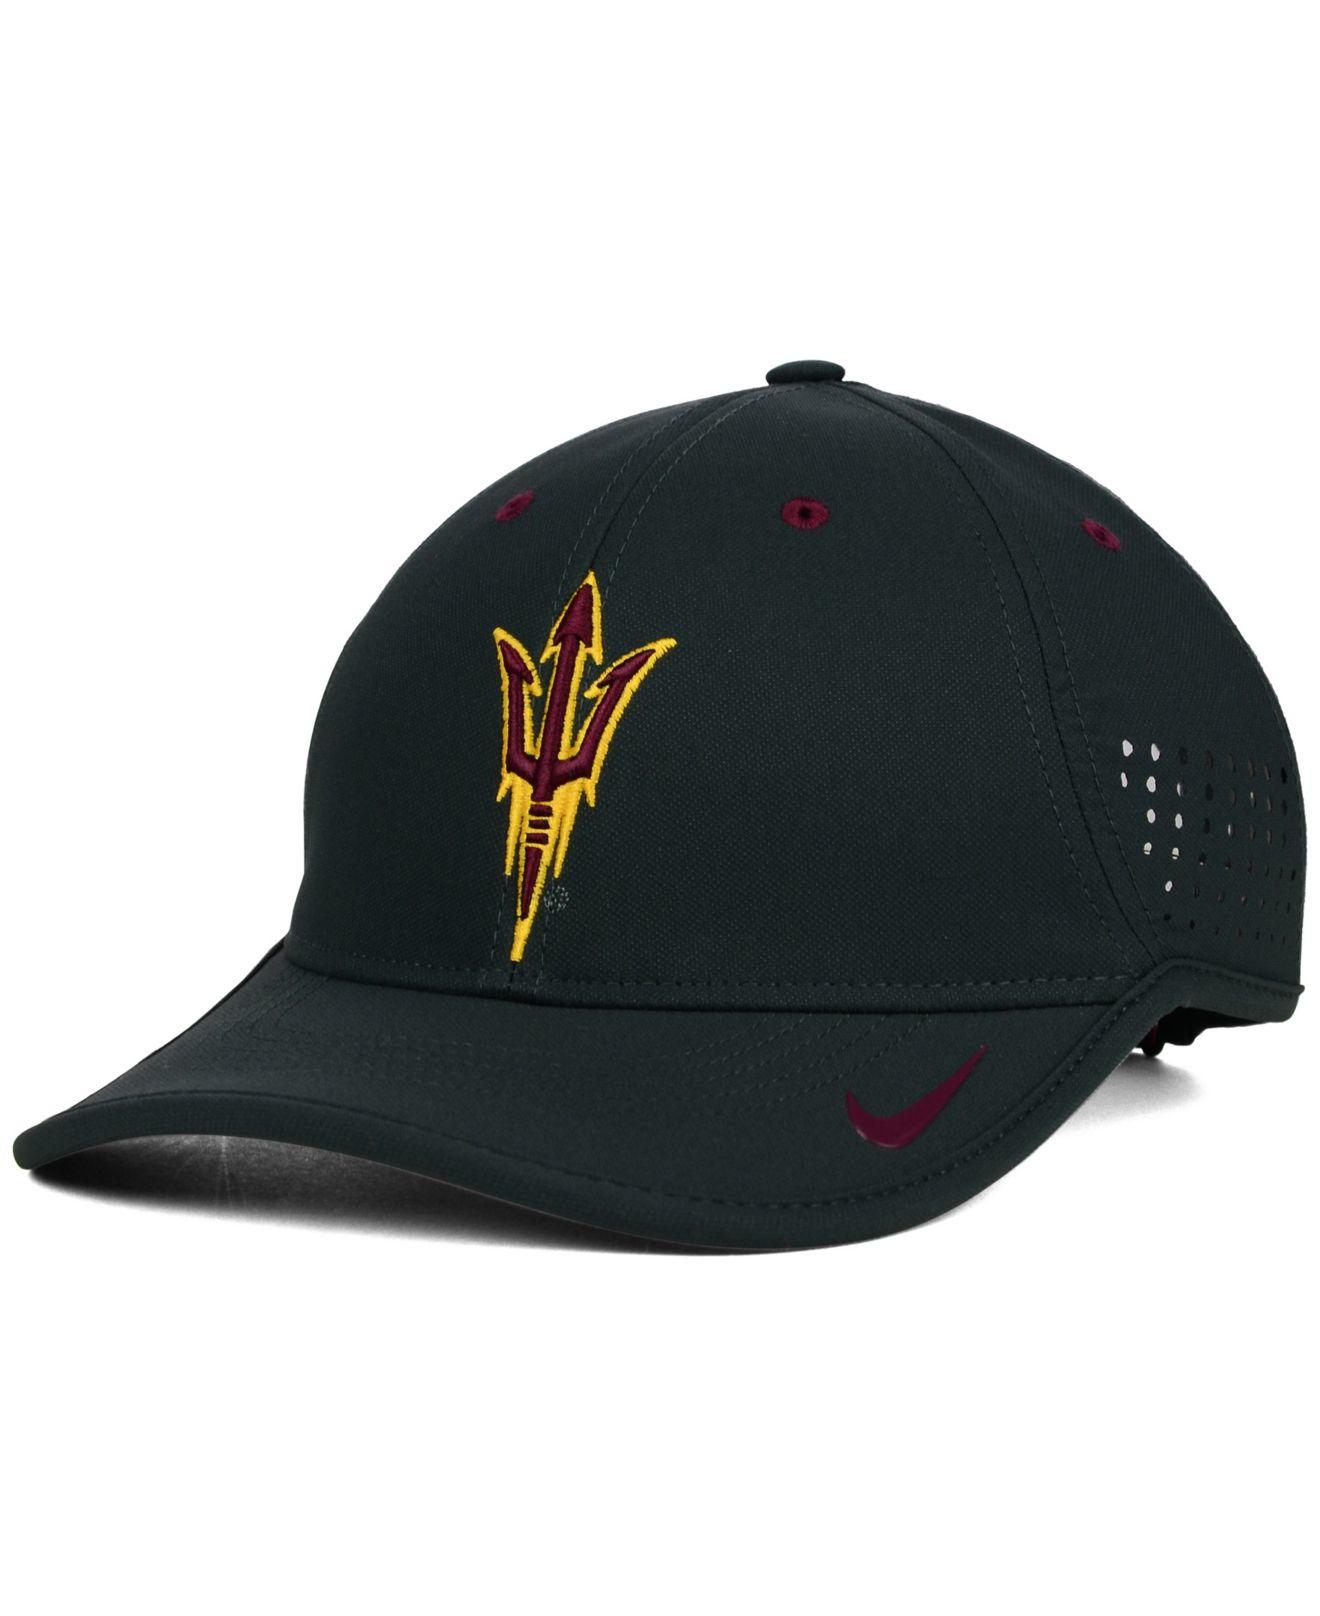 276115bed330d good nike arizona state university hat 06d7f 04b29  sweden lyst nike  arizona state sun devils dri fit coaches cap in gray for men c784a